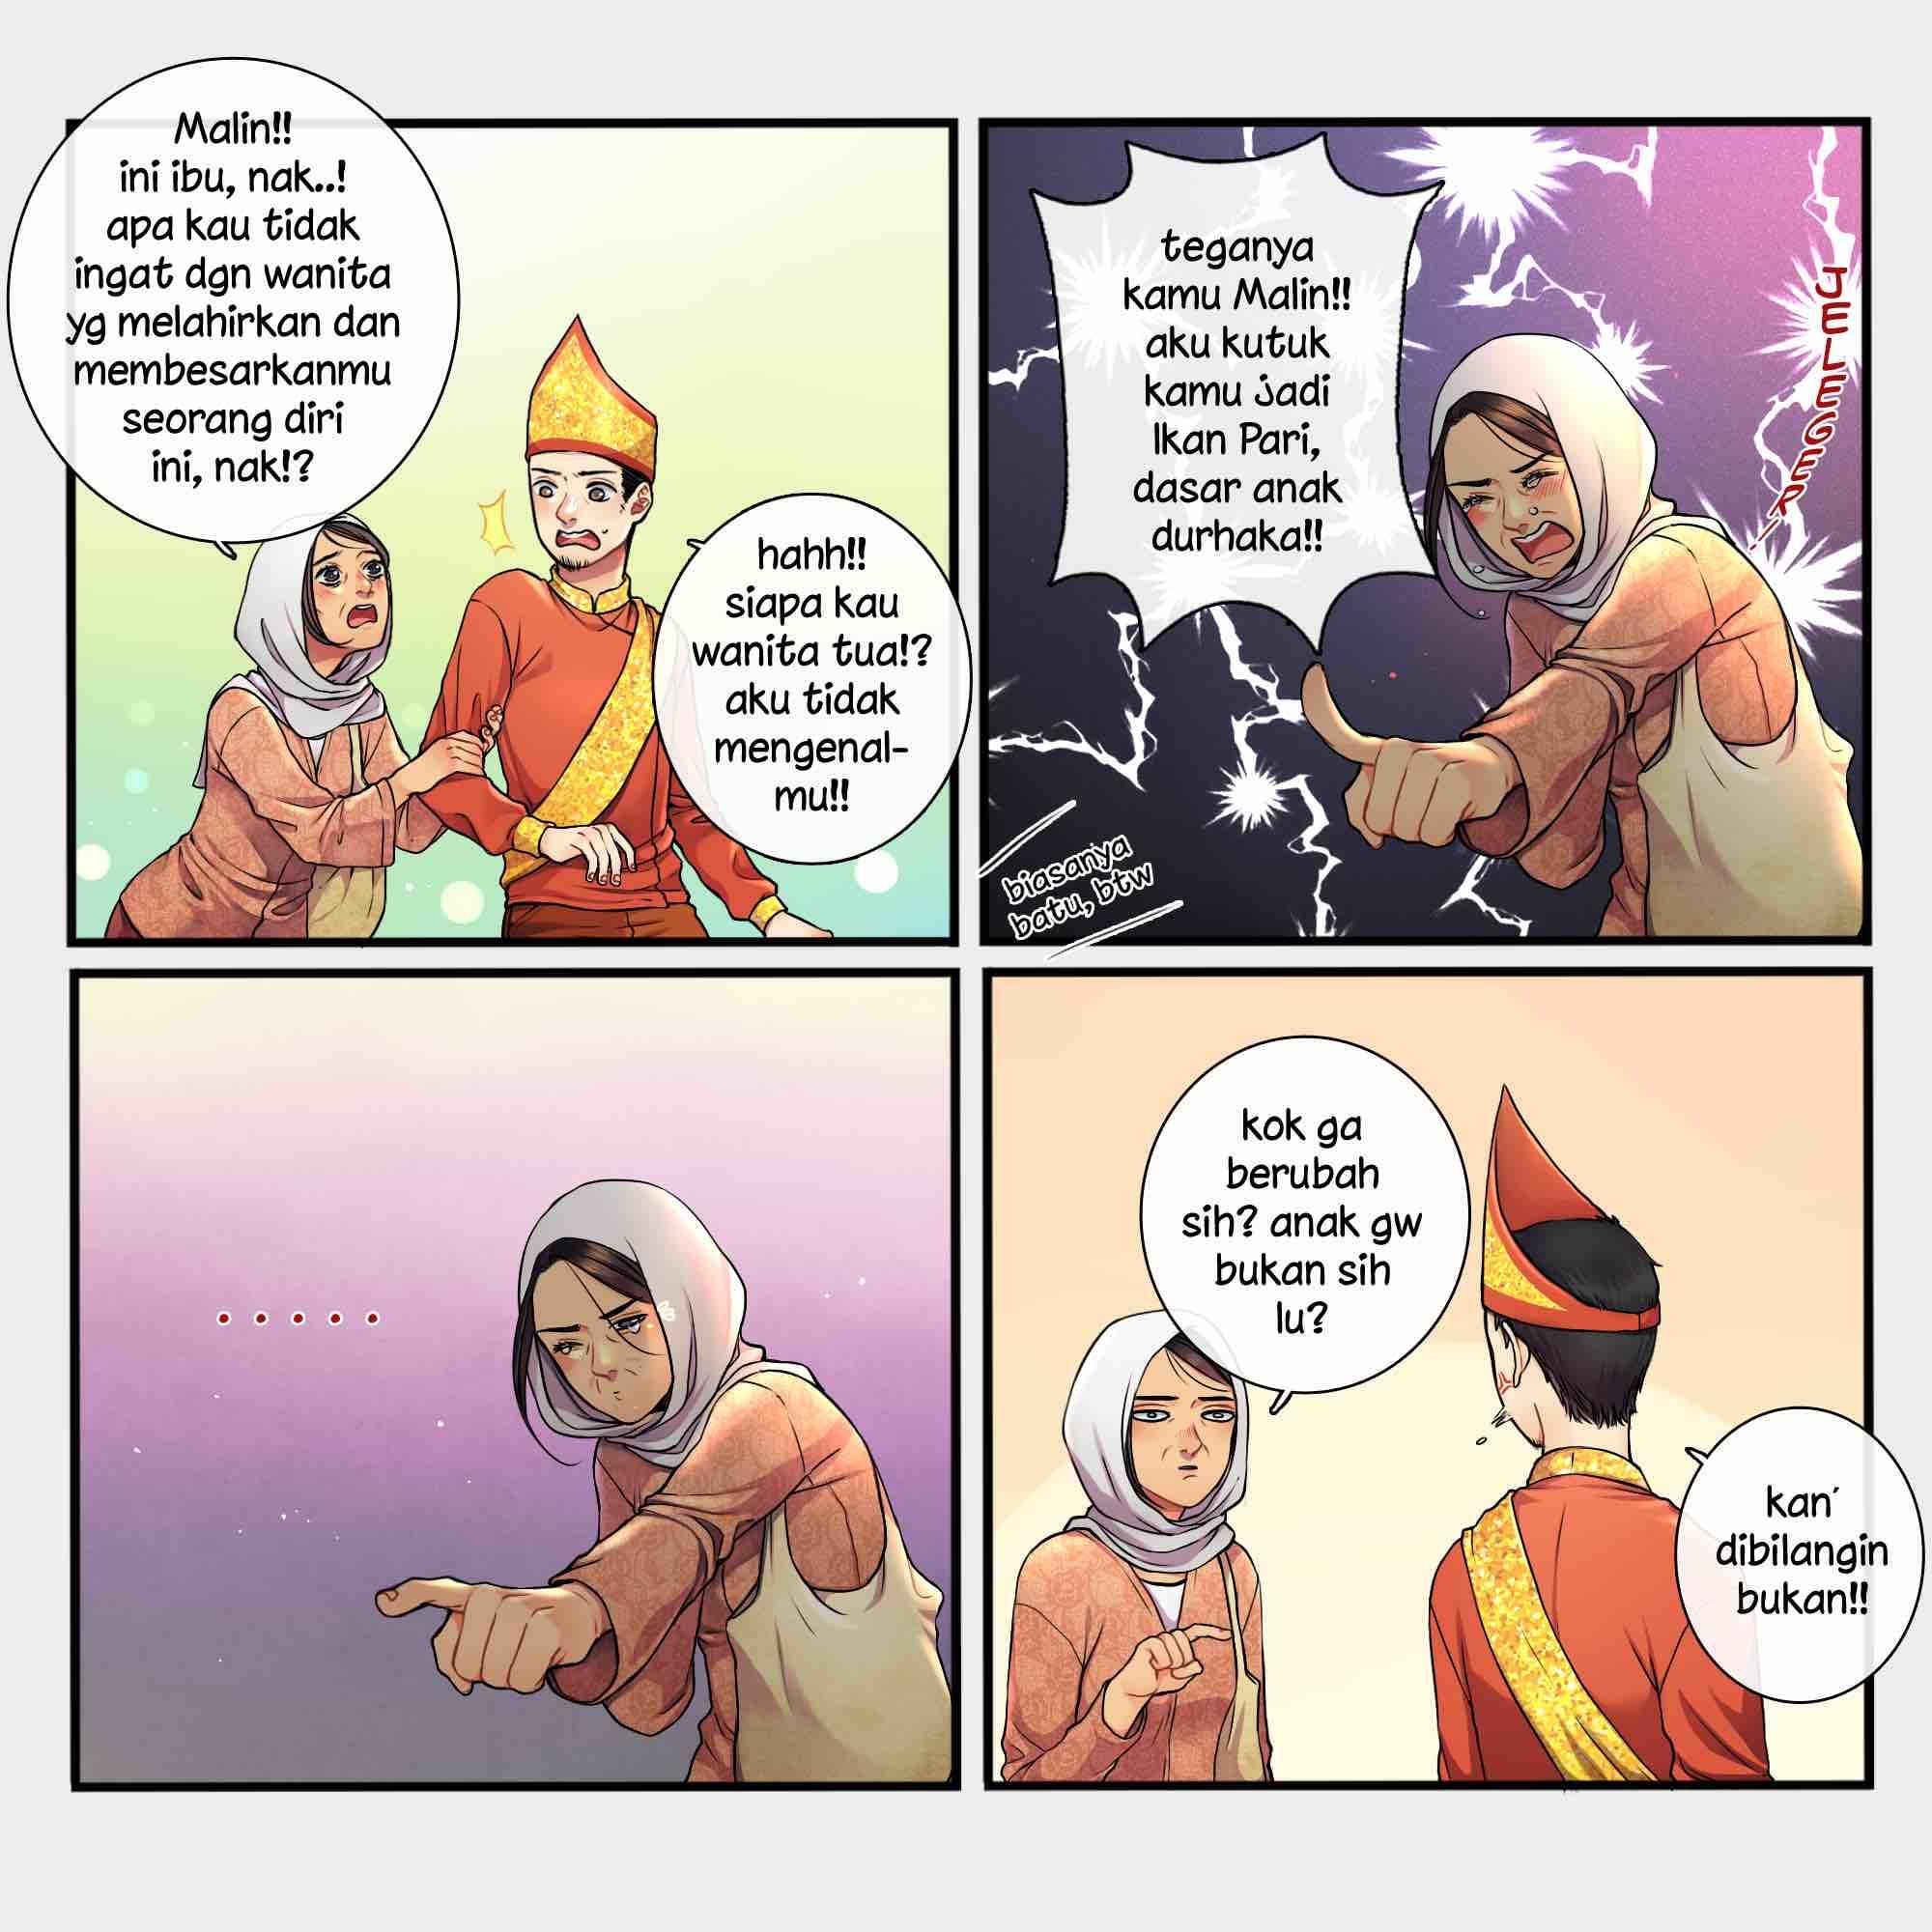 5 Langkah Merangkai Komik Strip Ala Maghfirare